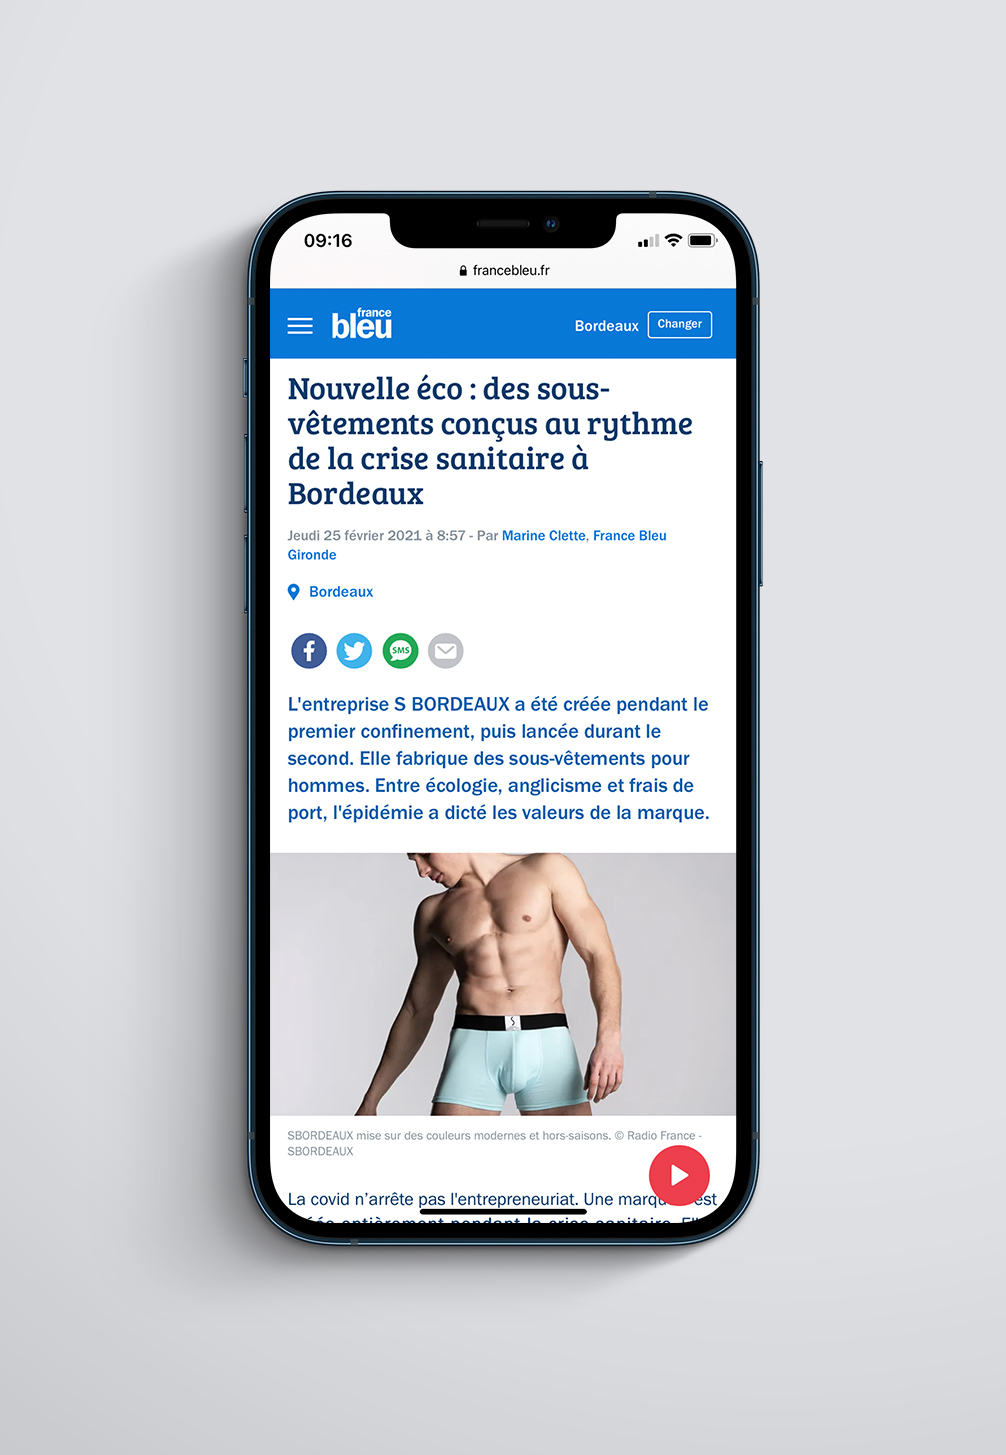 s-bordeaux-mockup-iphone-france bleu-02